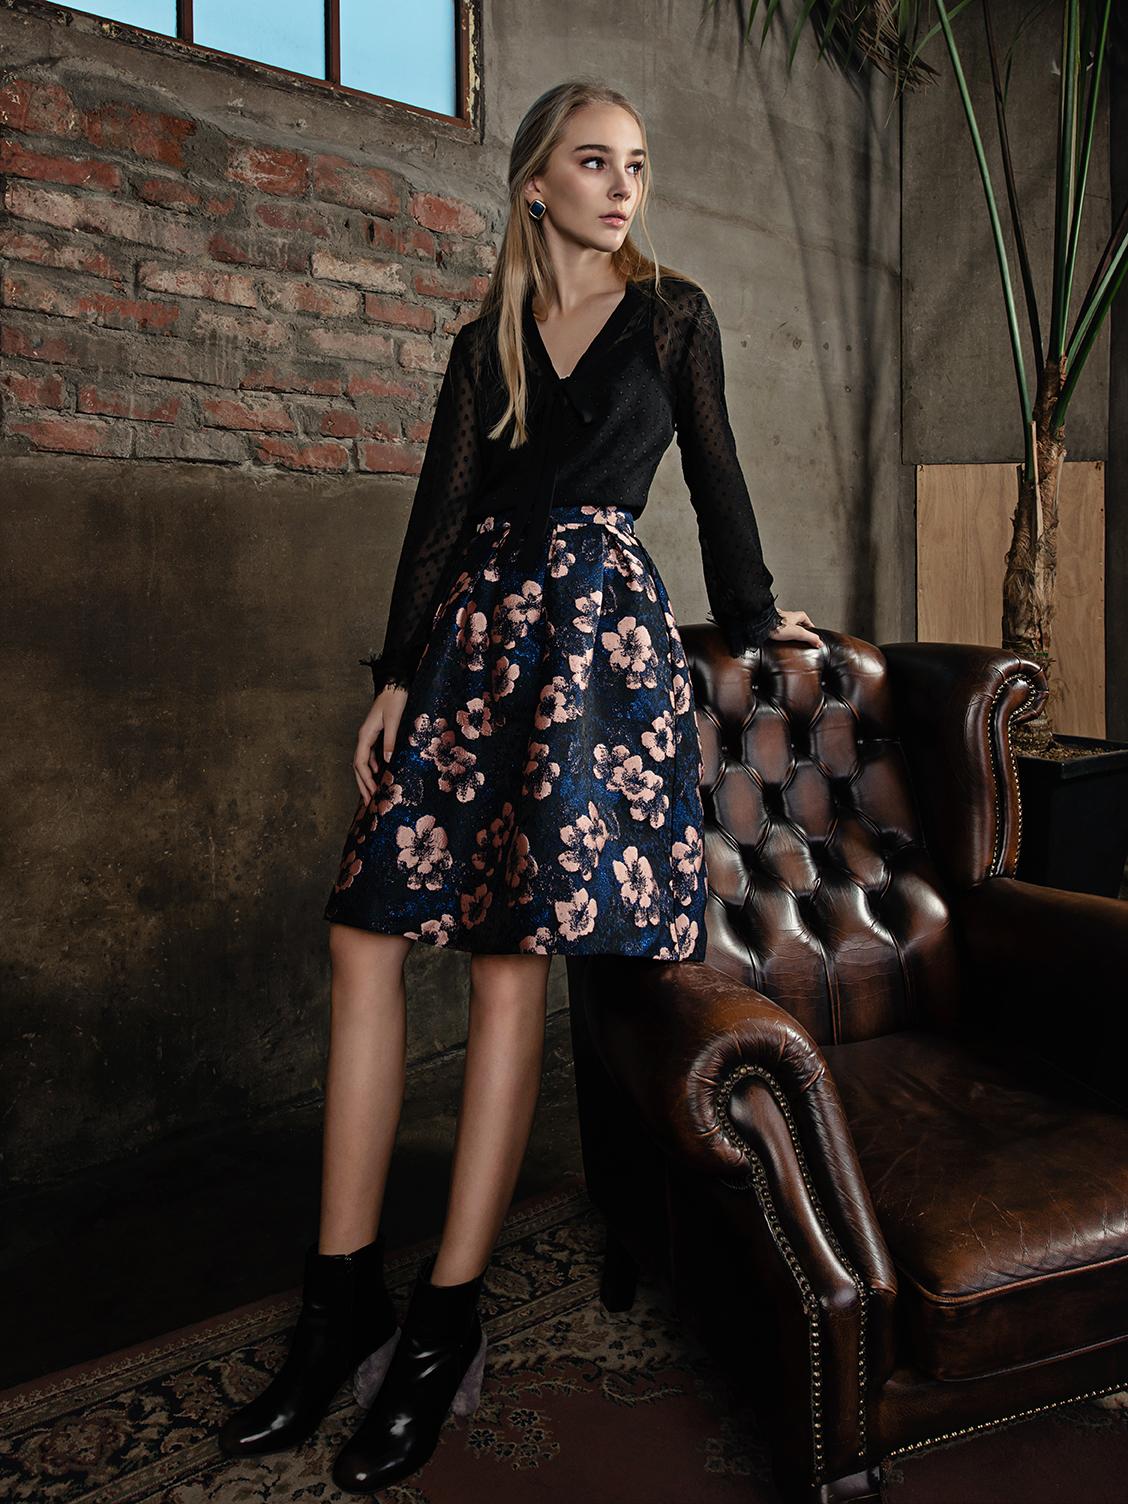 Coloured Faux Fur Coat, Textured Blouse & Side Open Trousers